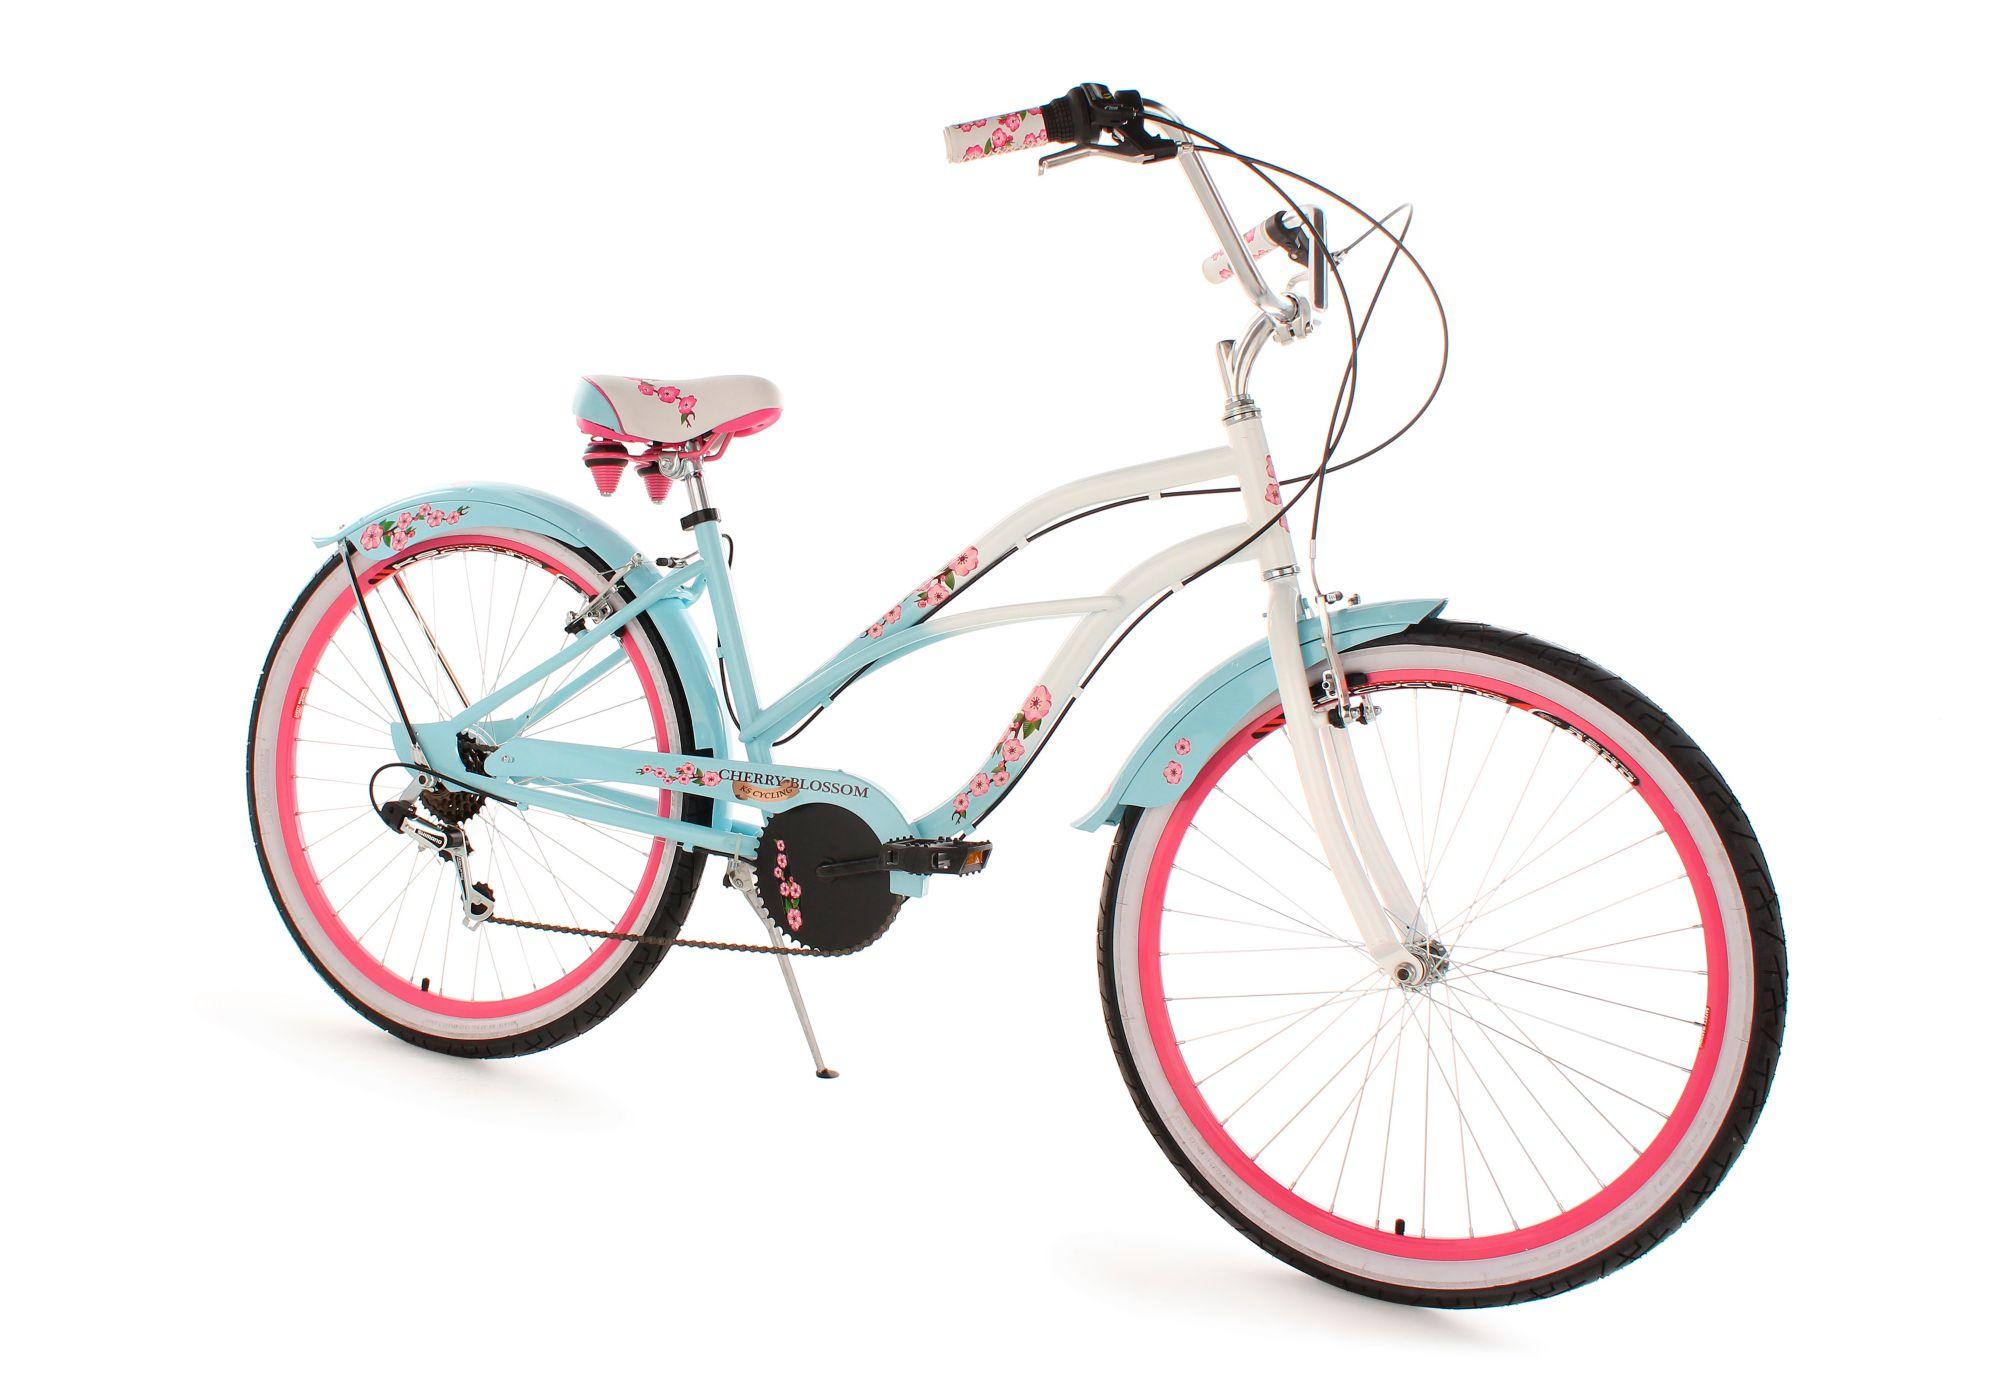 KS CYCLING Beachcruiser Damen, 26 Zoll, 6-Gang Shimano Tourney Kettensch., blau, »Cherry Blossom«, KS Cycling